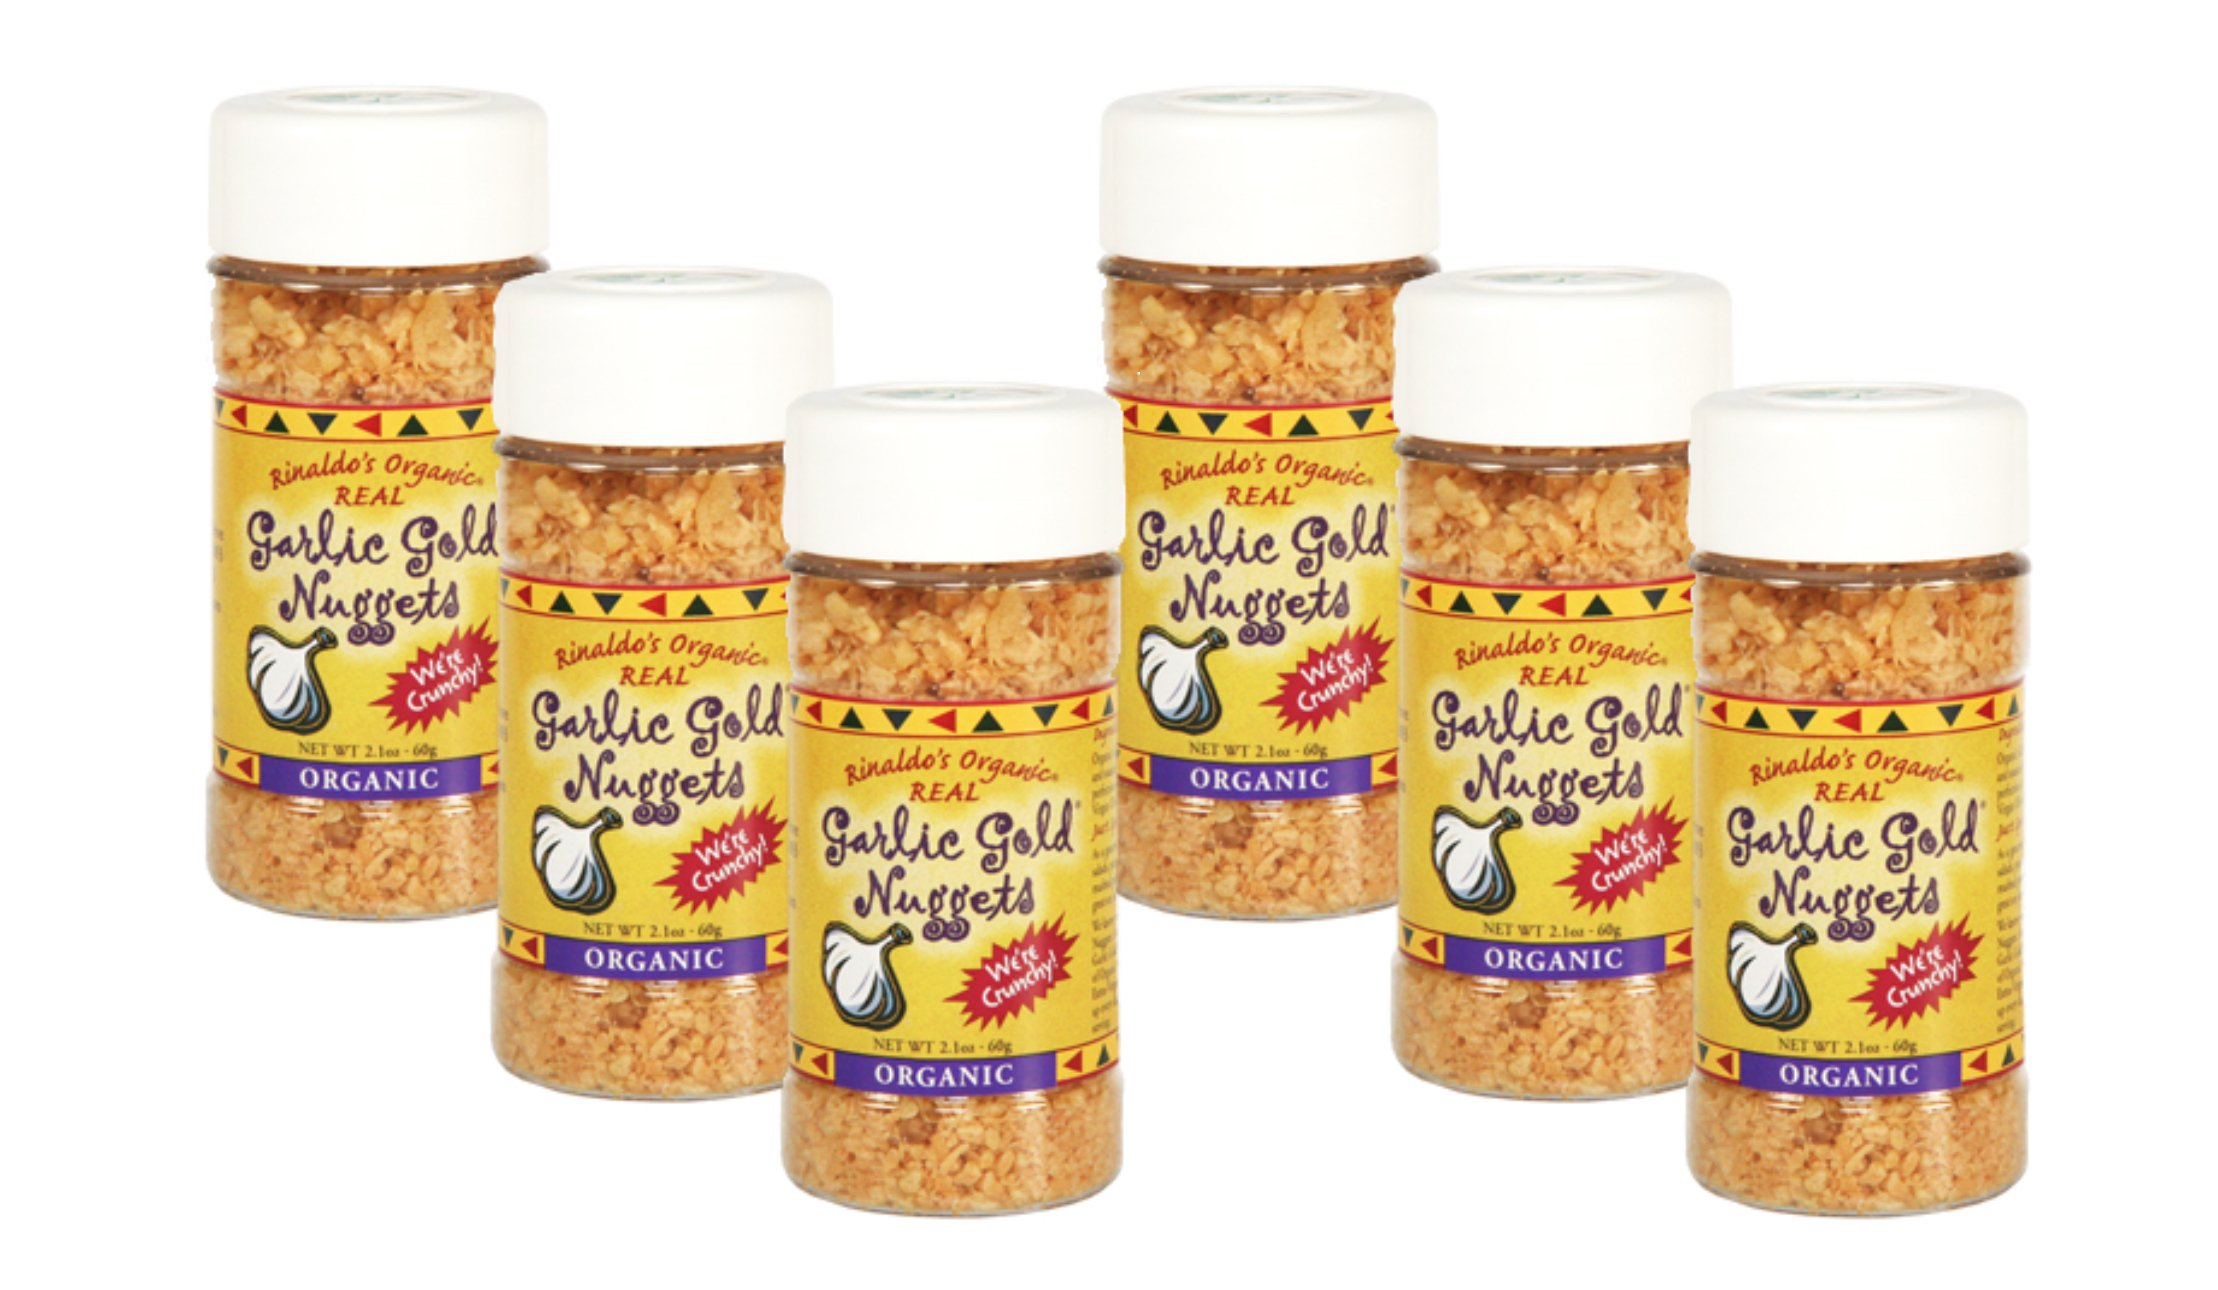 USDA Organic Garlic Gold Nuggets, Roasted Organic Garlic Seasoning Granules, Sodium Free & MSG Free, Vegan 2.1-Ounce Shaker Jar (Pack of 6)